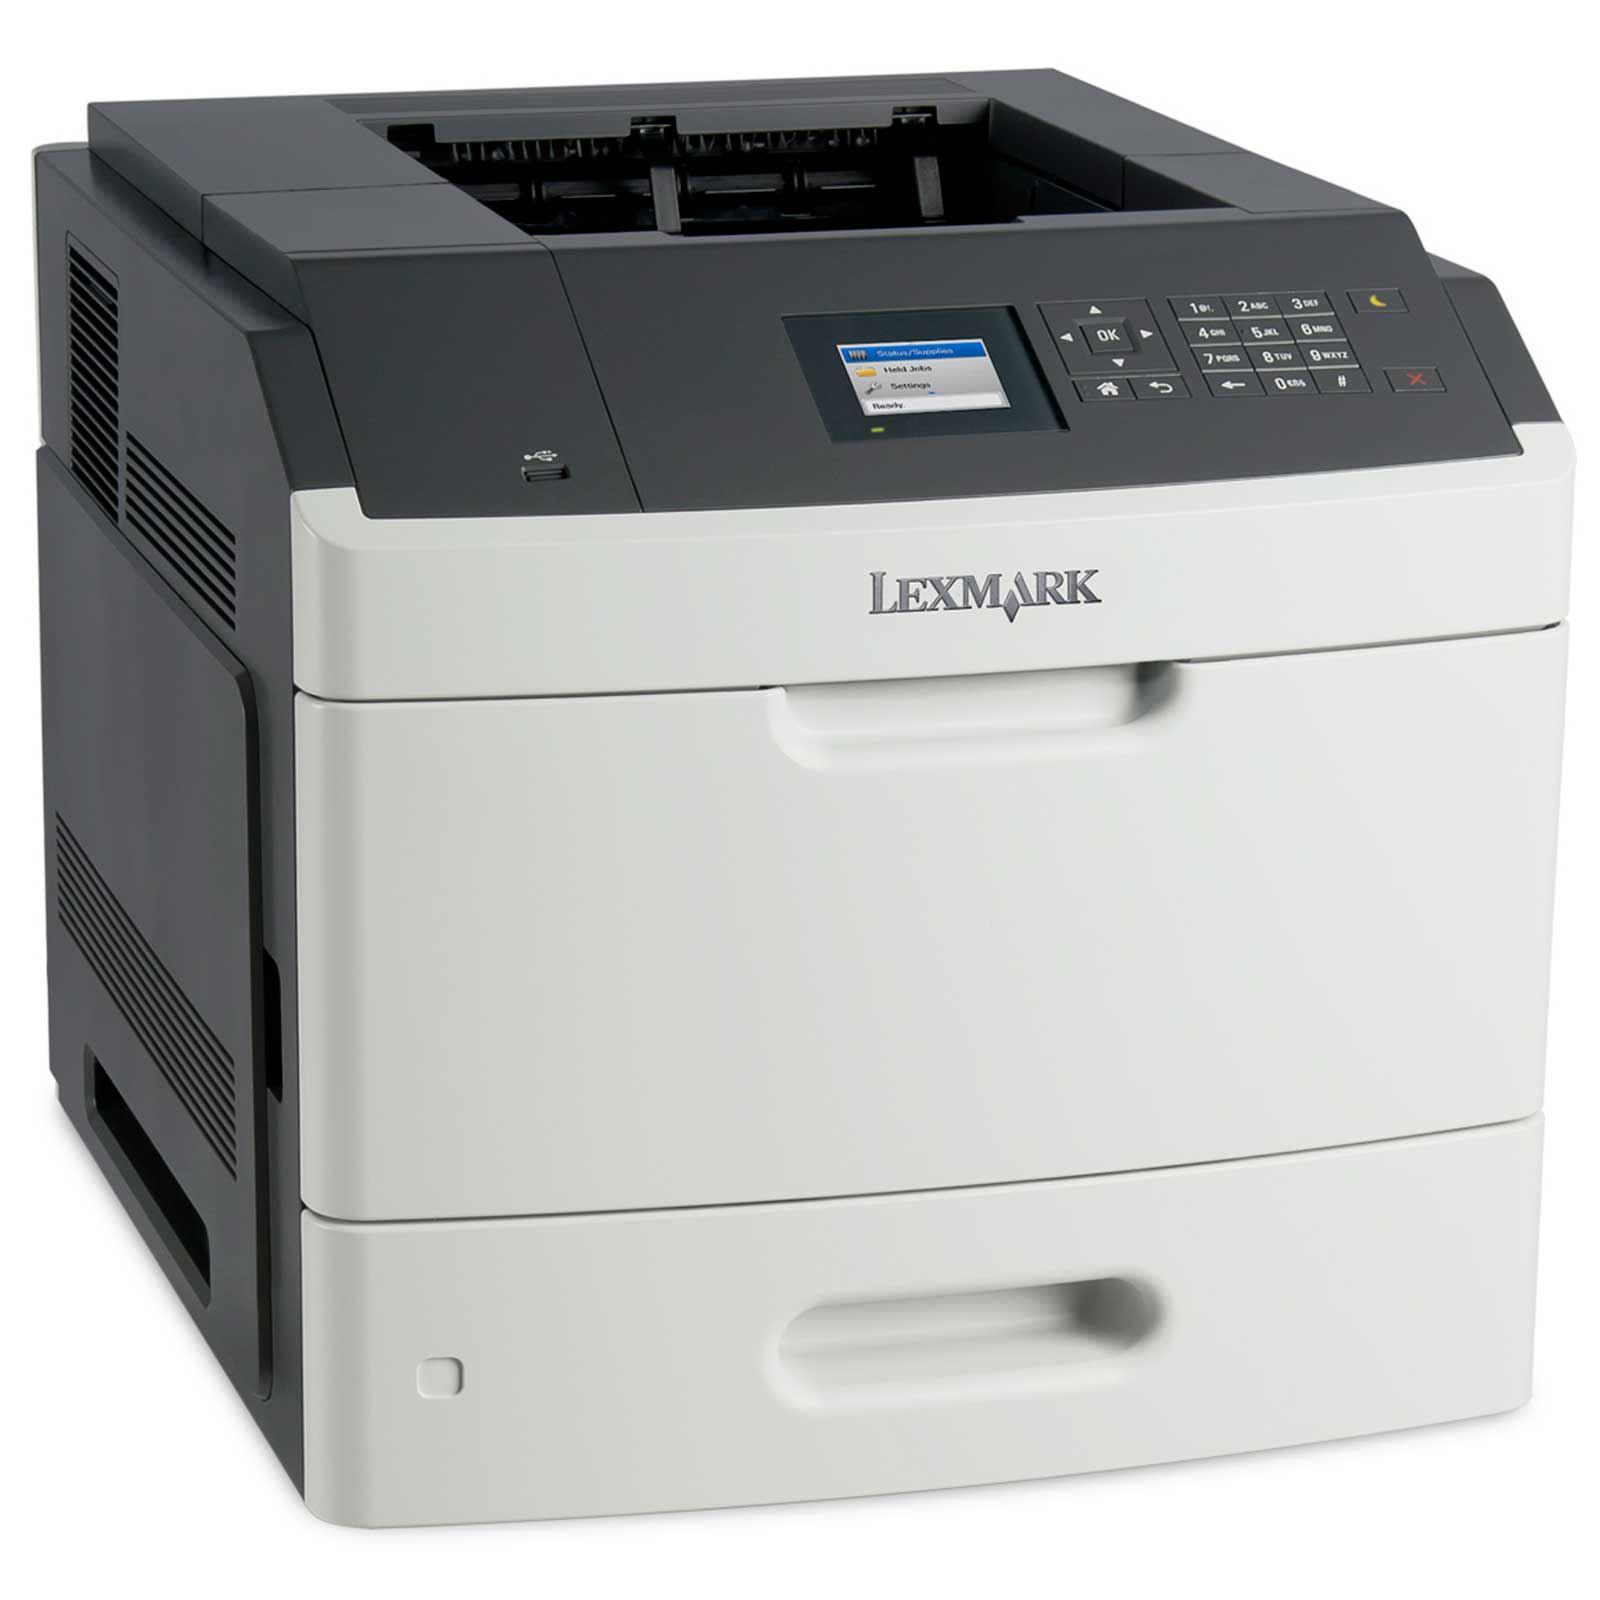 LEXMARK tiskárna MS810dn, A4 52ppm, 512MB, MONOCHROME LASER LAN, USB, duplex